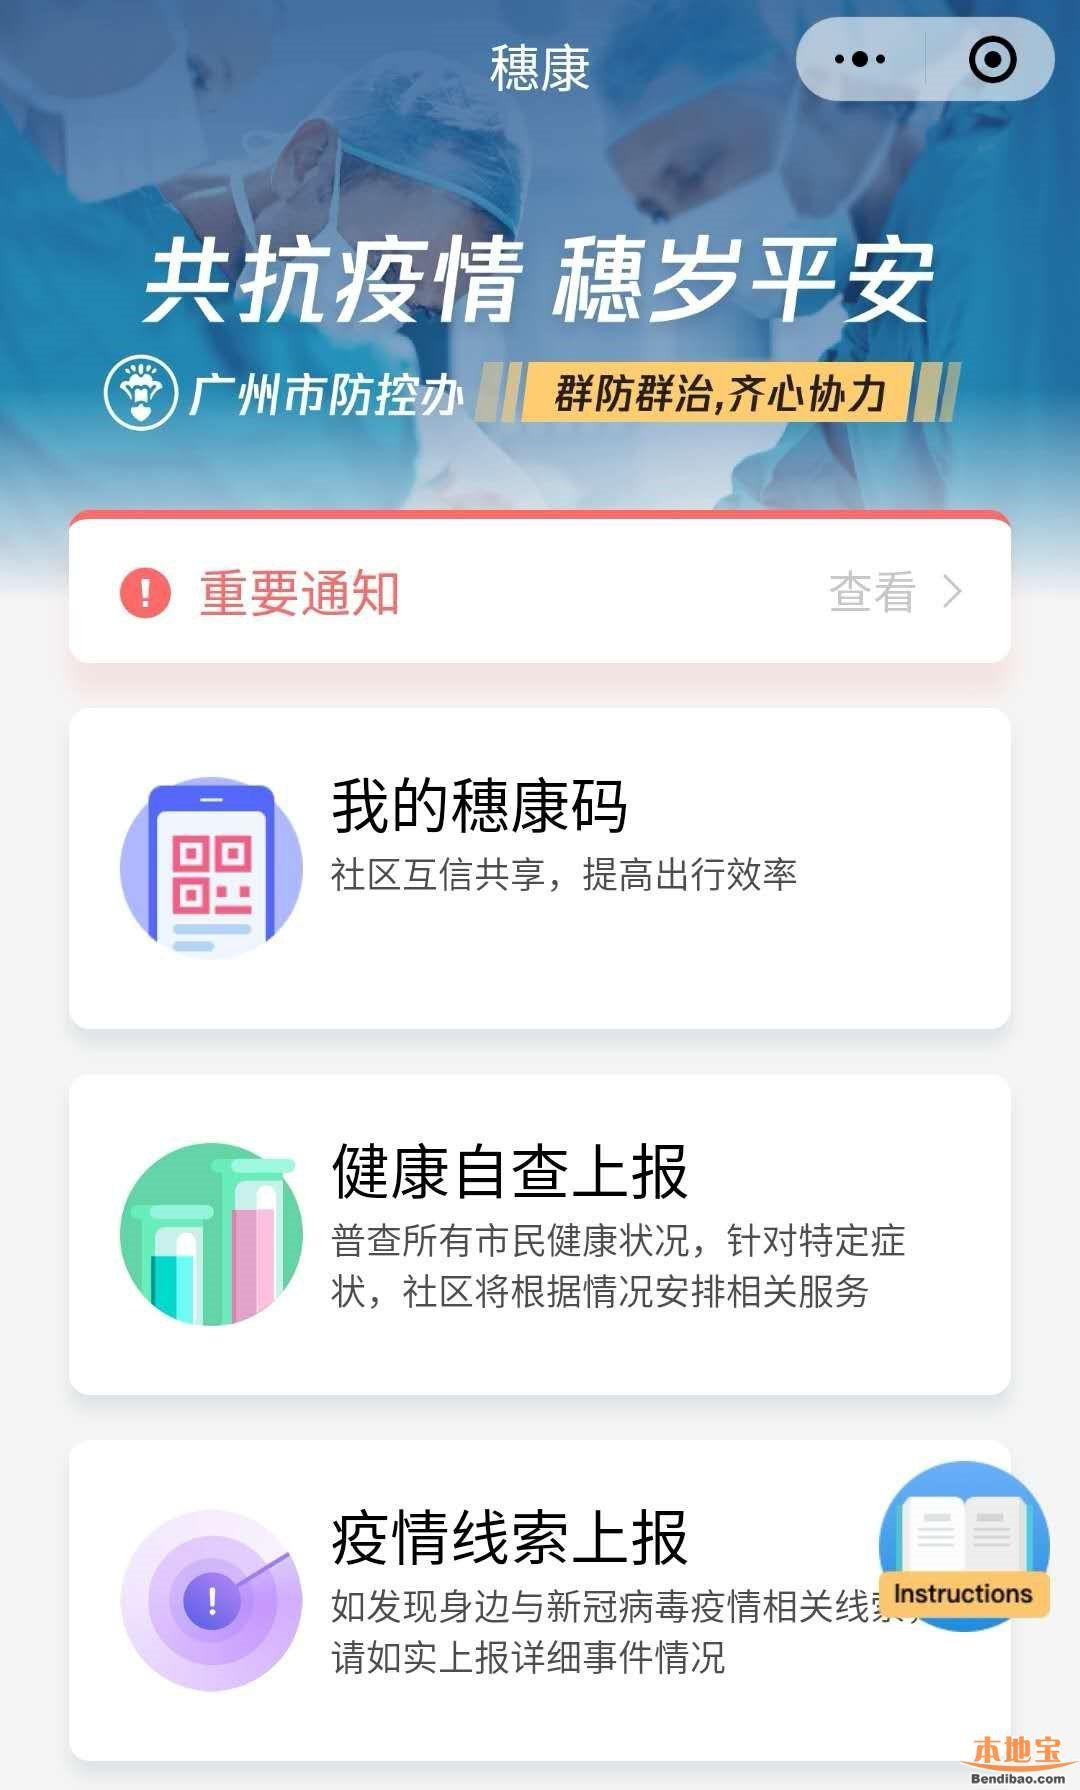 http://www.21gdl.com/guangdongfangchan/214433.html